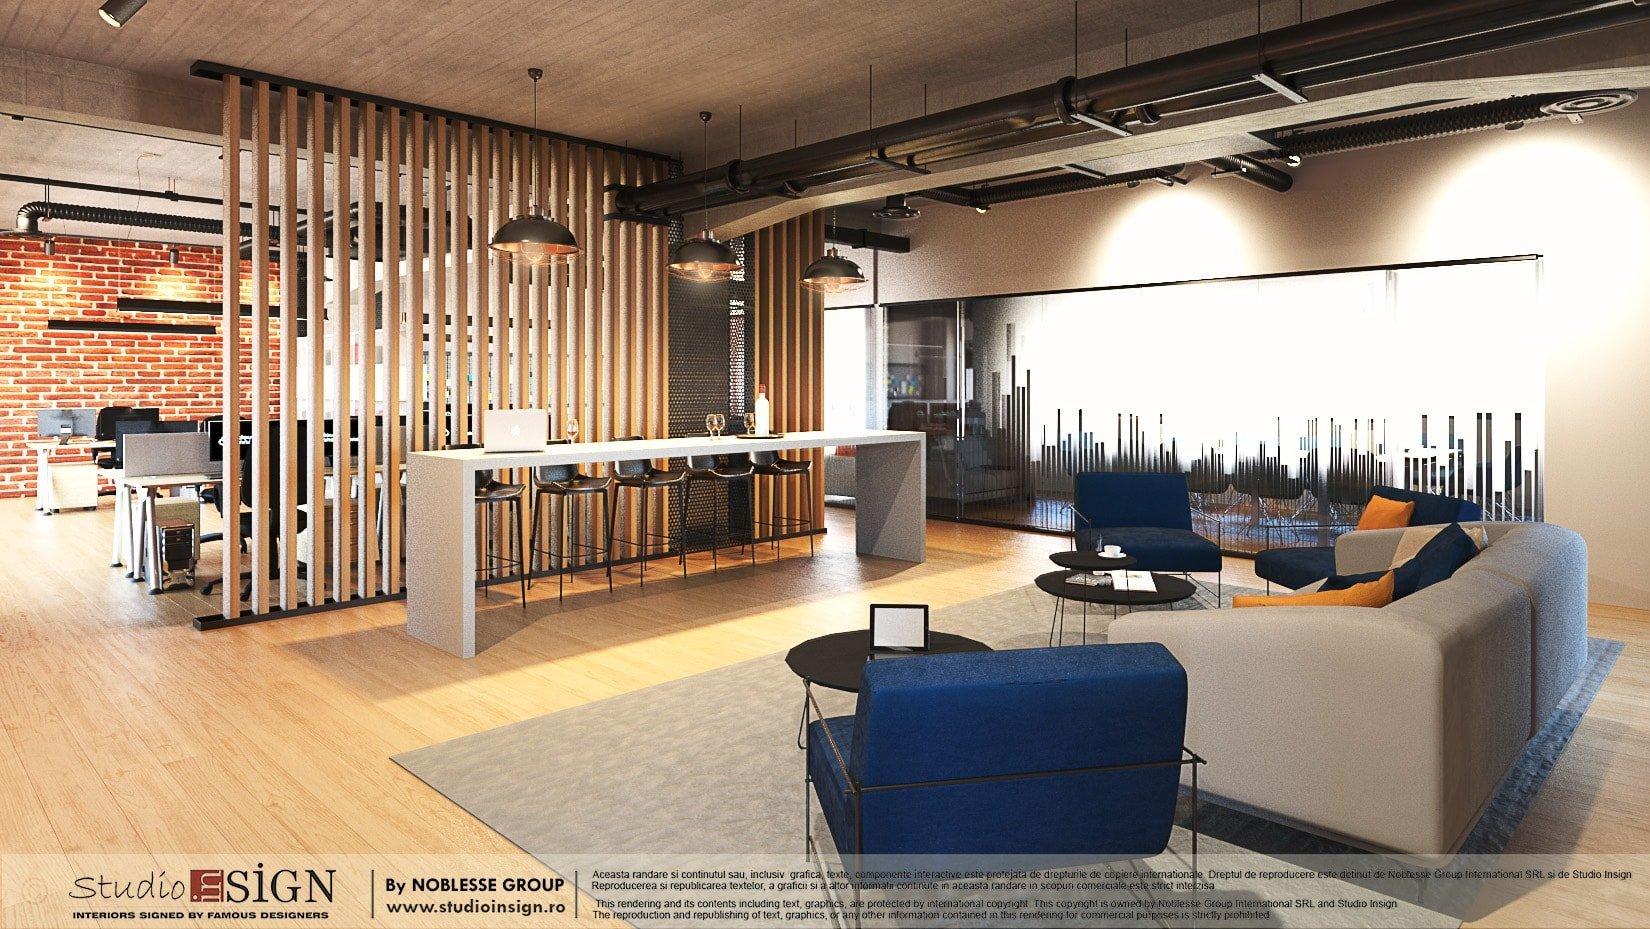 Digital marketing offices modern industrial interior - Modern industrial interior design ...